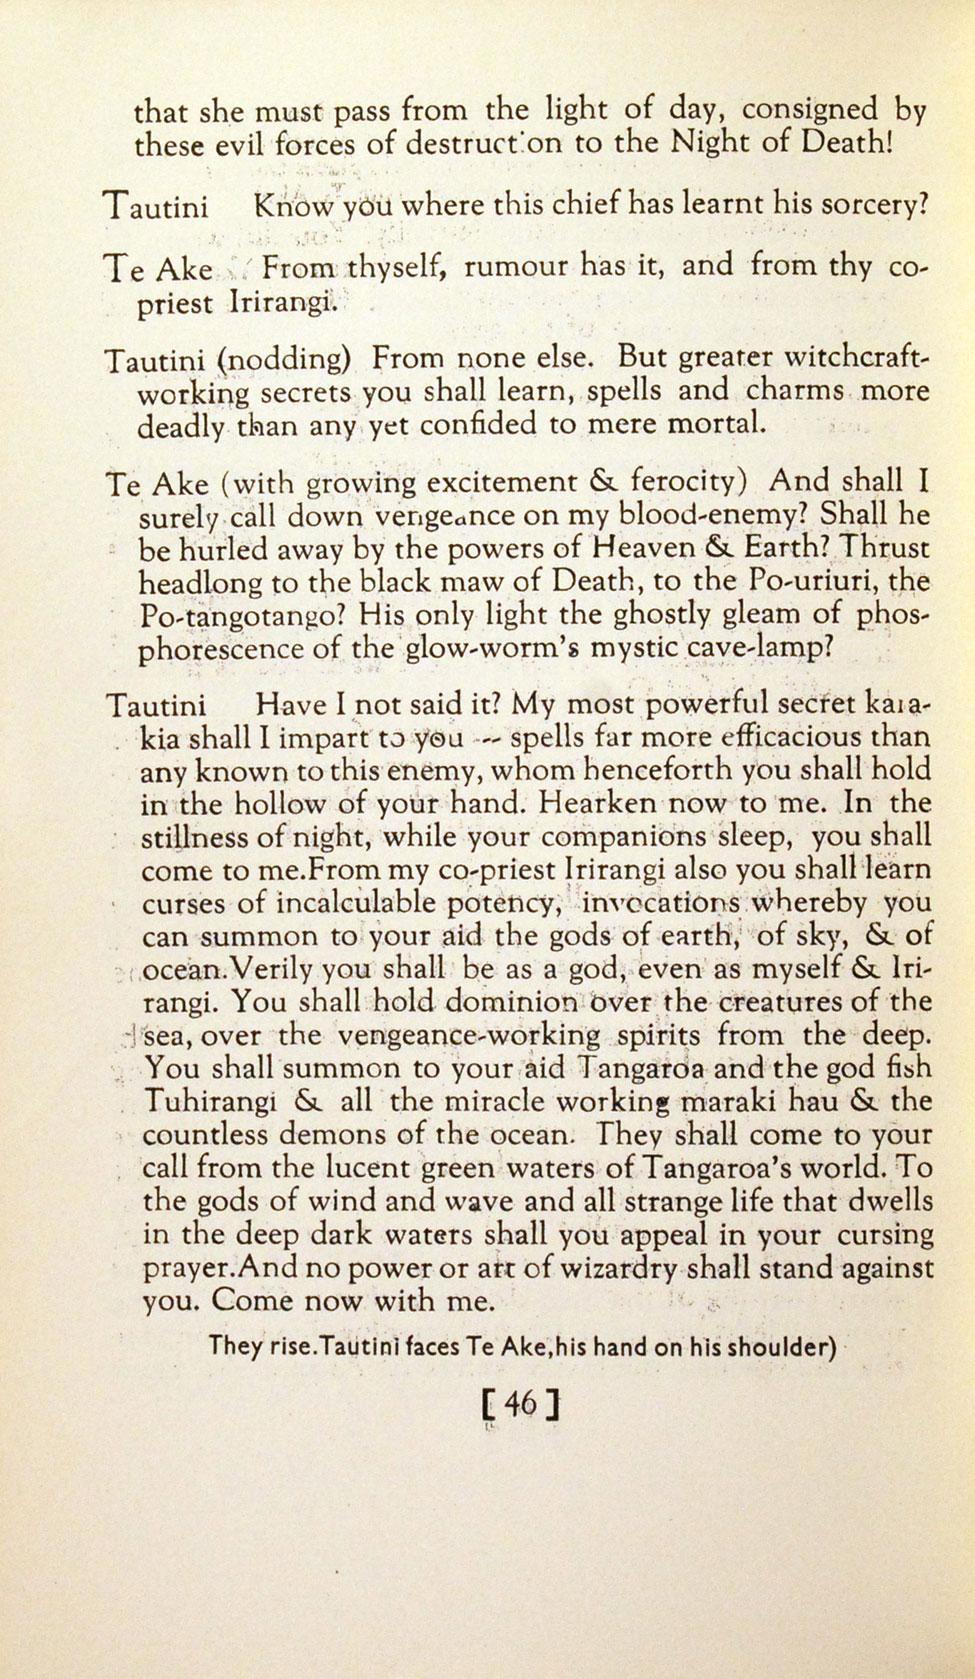 Janet McLeod. <i>Little Plays from Maori Legend. Christchurch: The Caxton Club Press, [1933].</i>